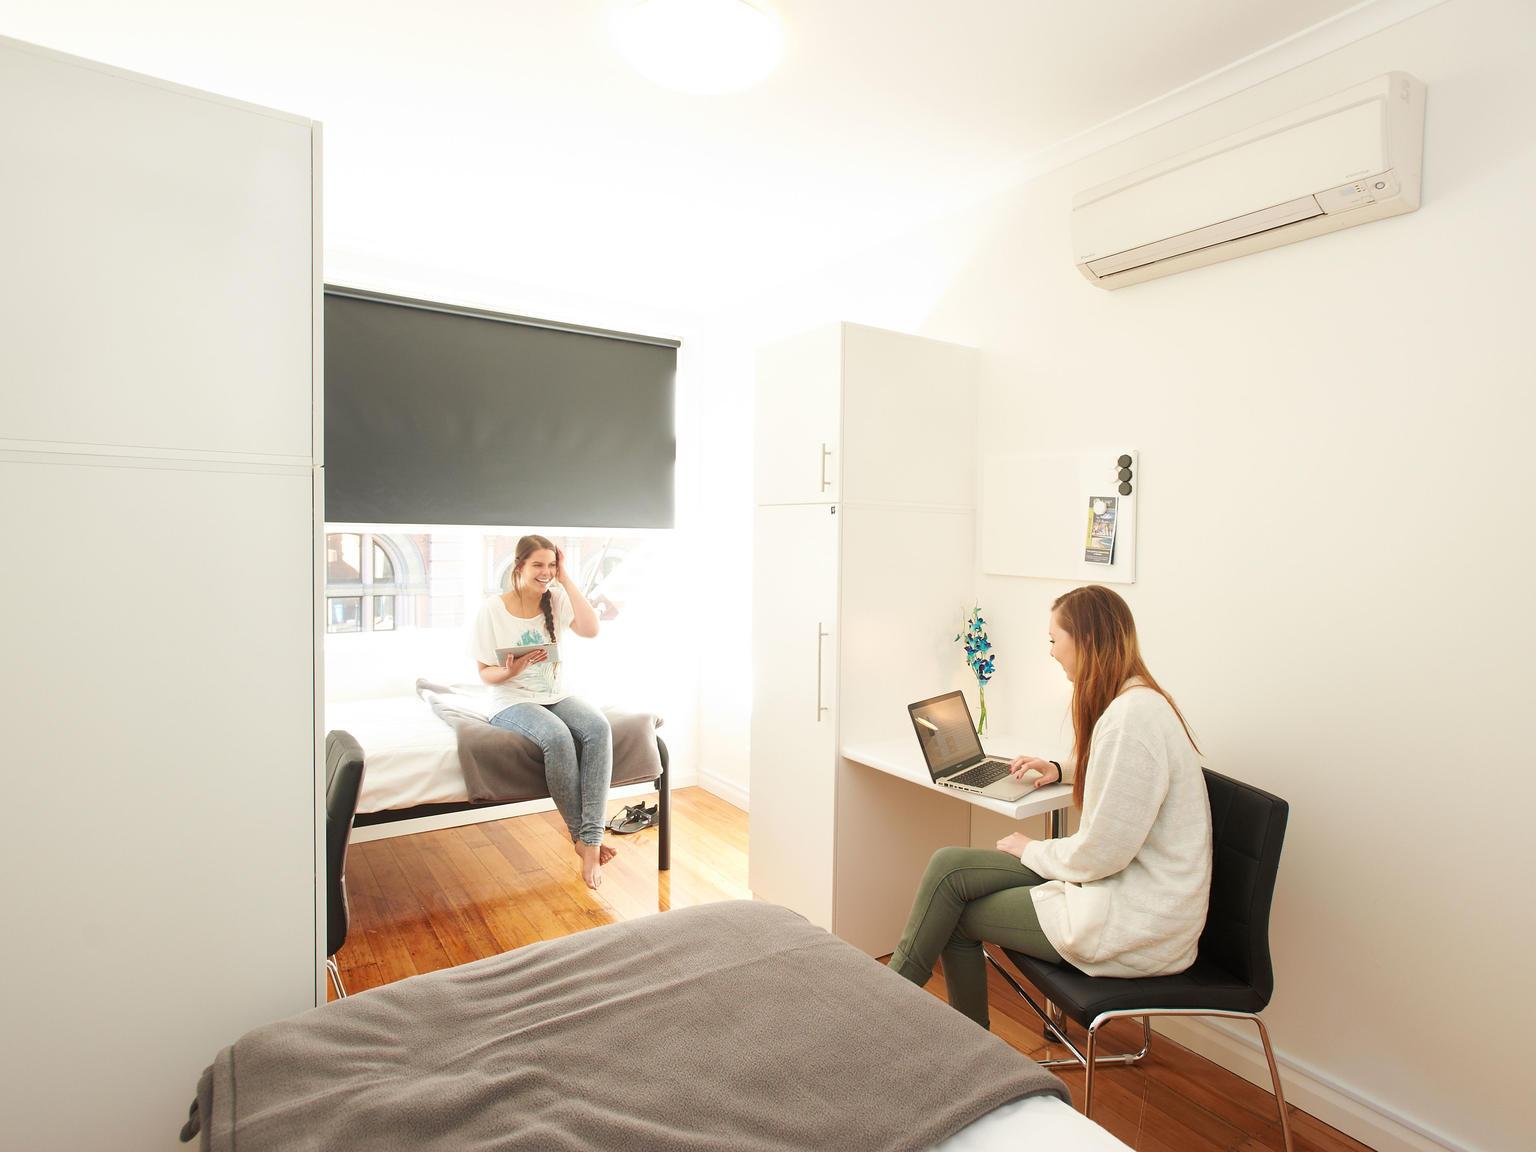 sydney_acc_link2_residence_bedroom_02-1